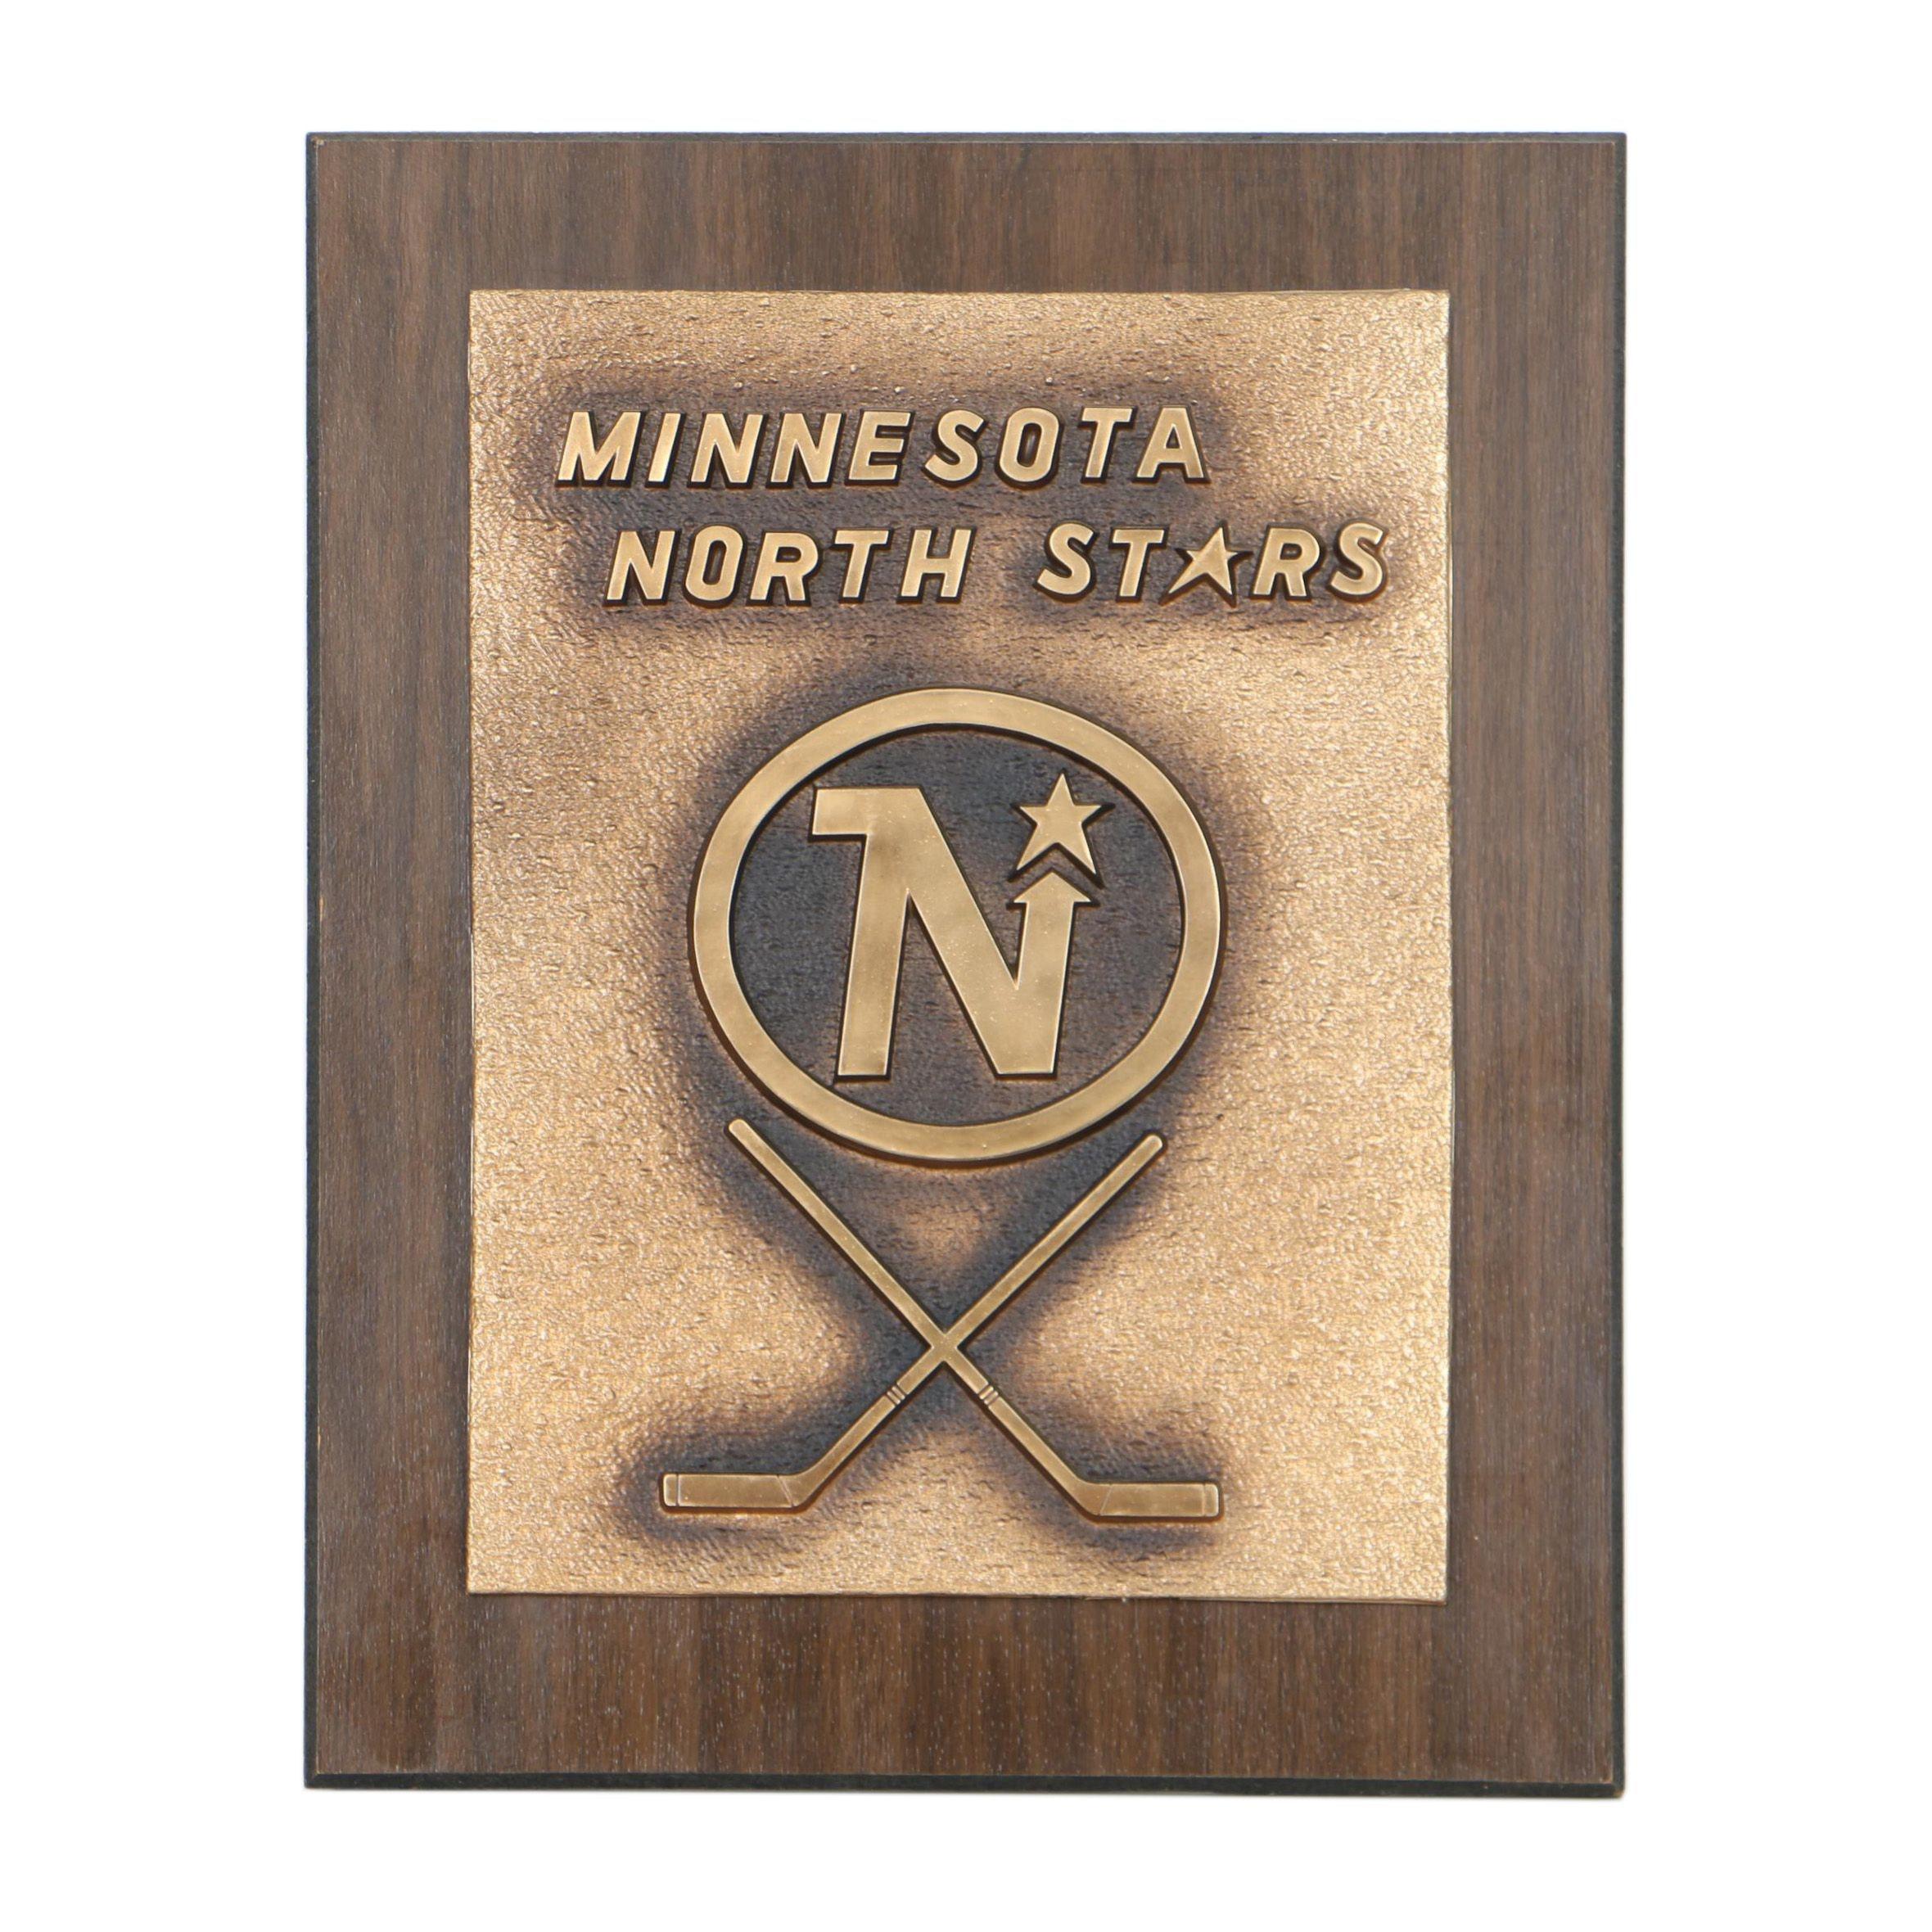 Minnesota North Stars National Hockey League Wall Plaque